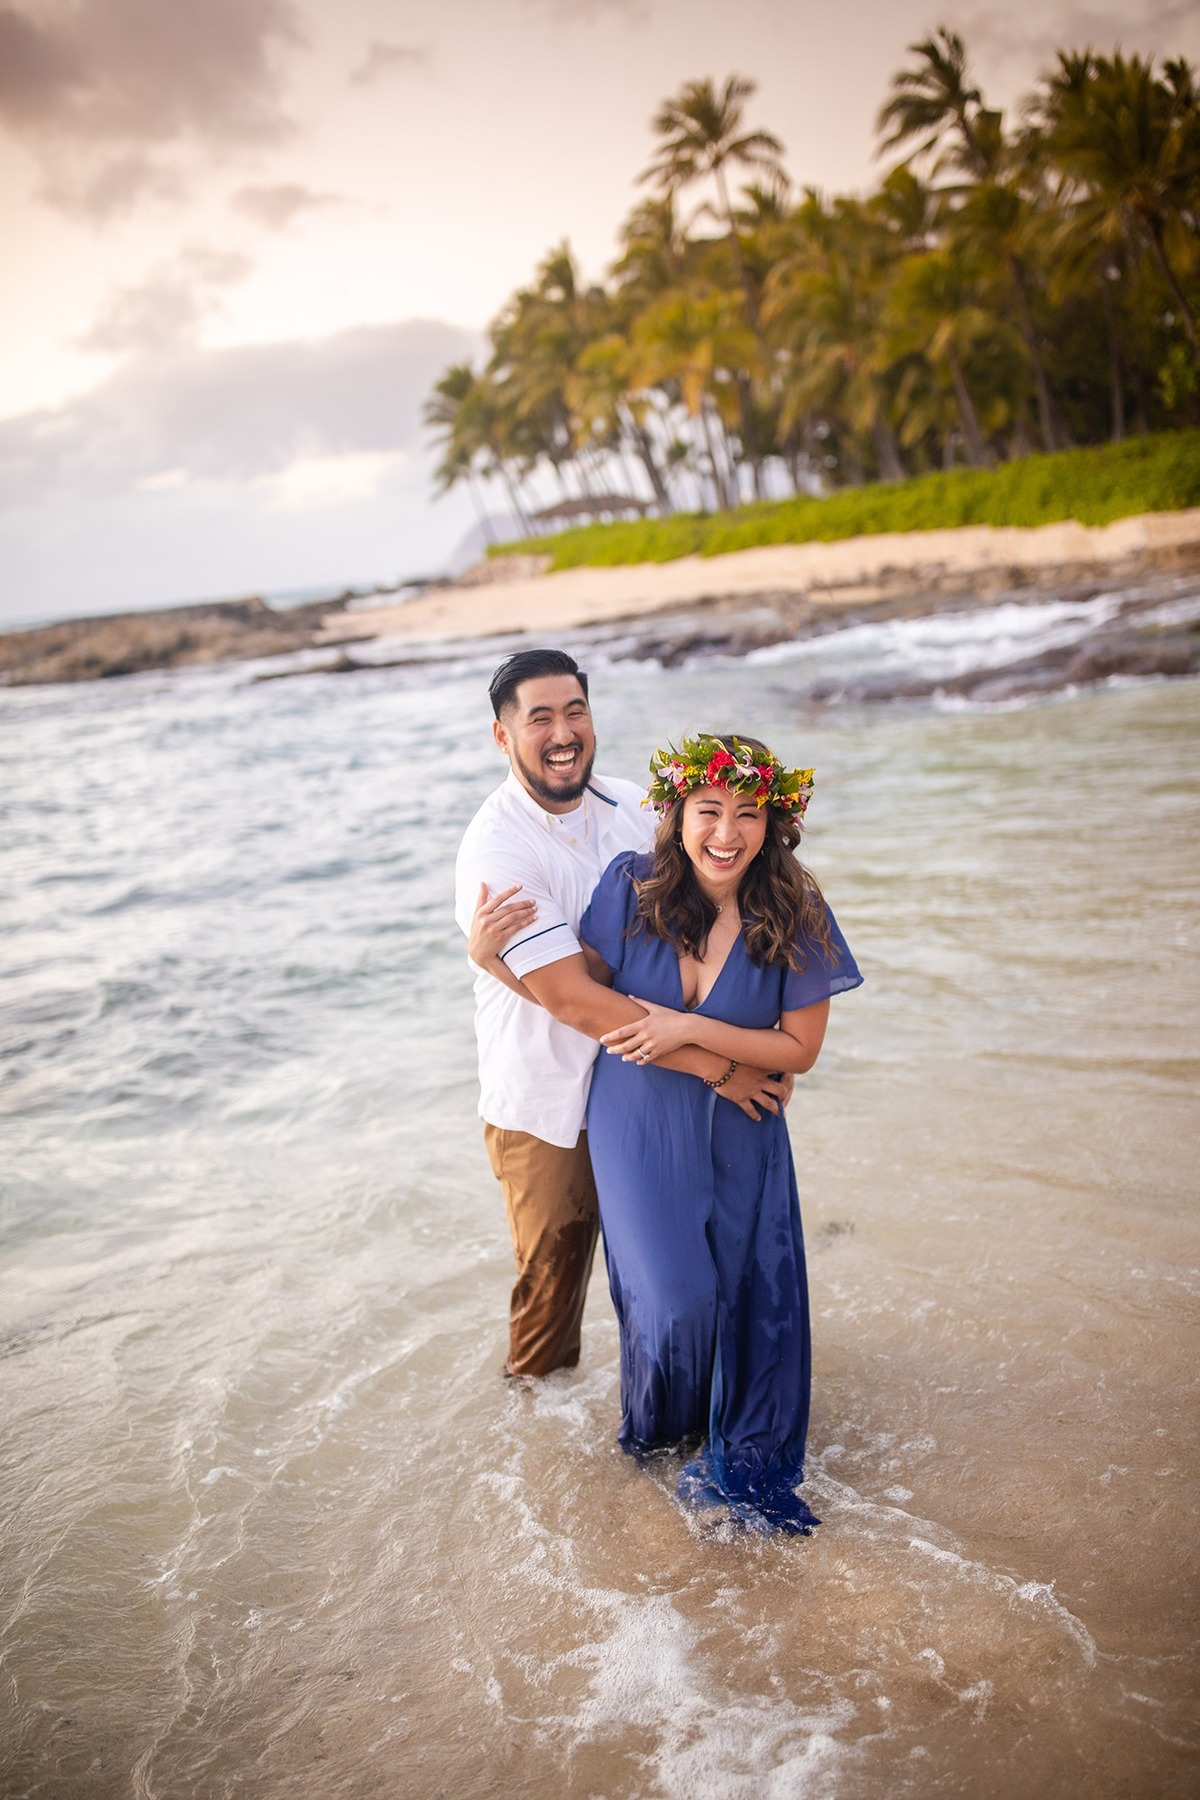 Hawaii Engagement Photographer Oahu Sunset Beach Couples